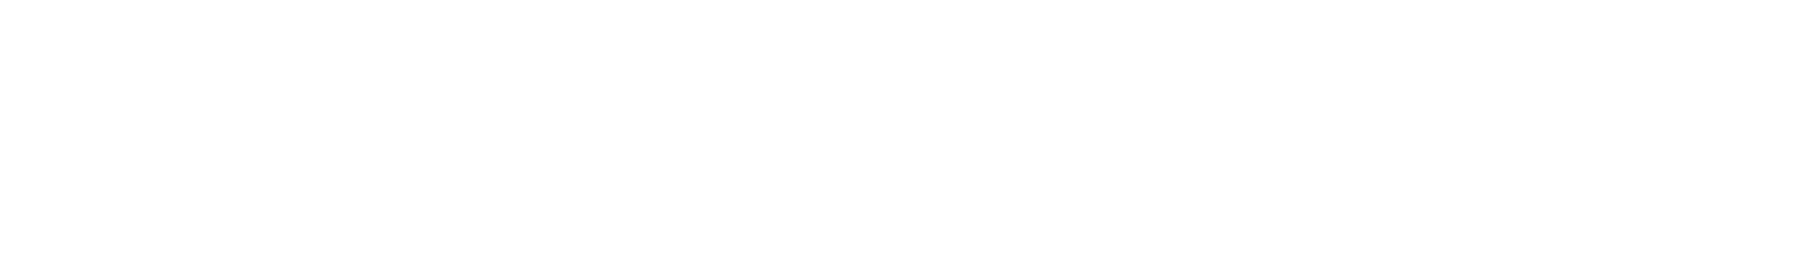 trm 125 c strings1